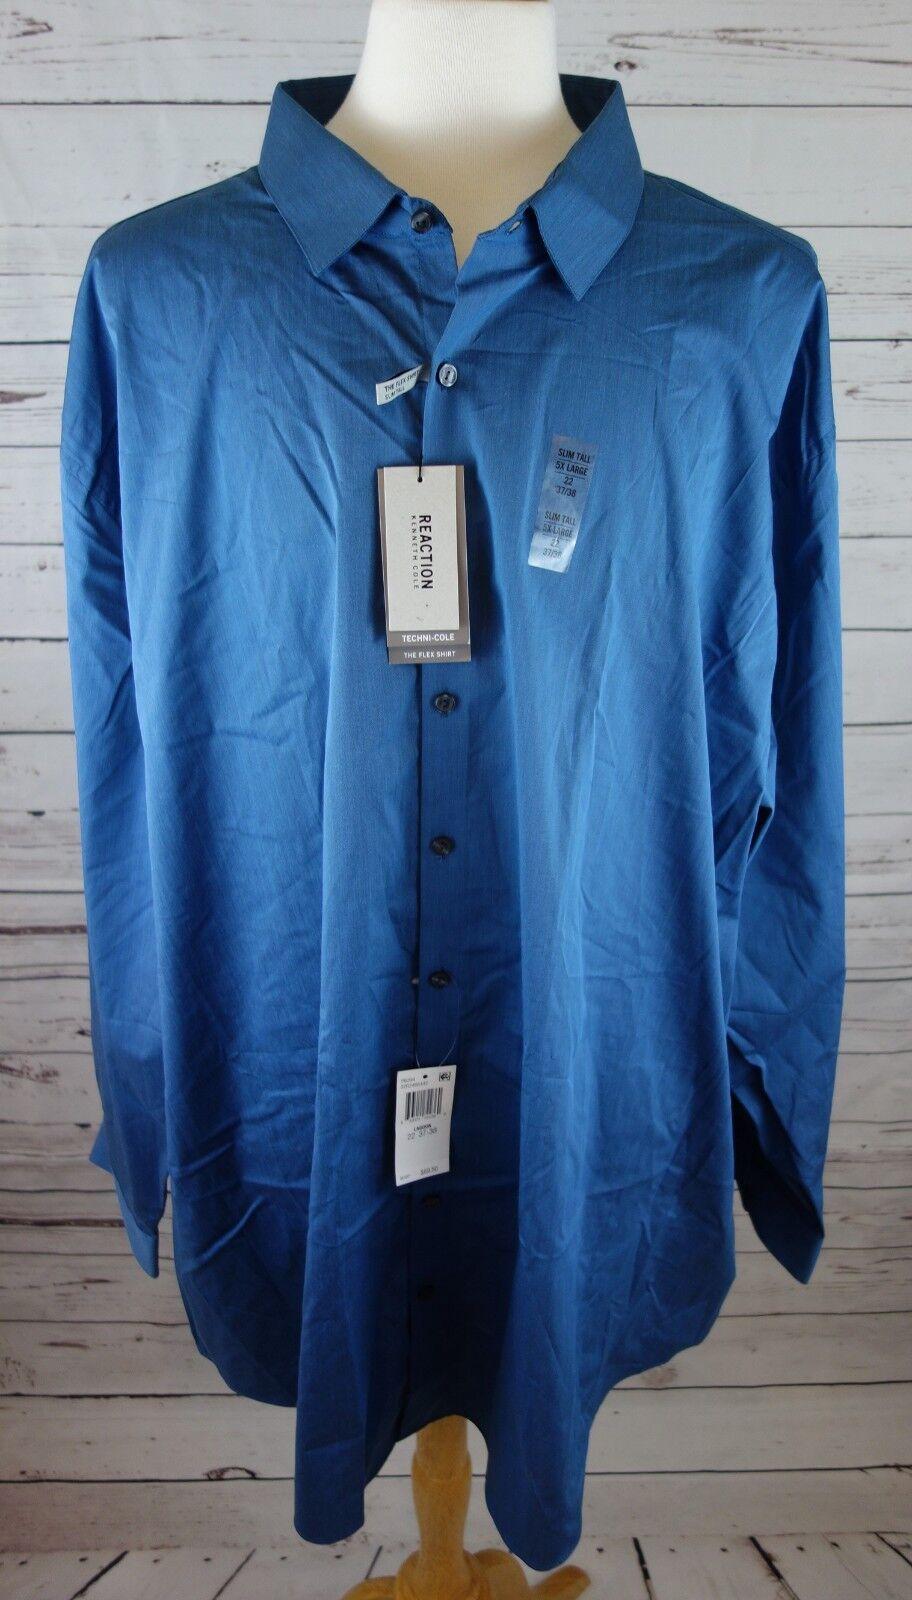 b79d6088 NEW Kenneth Reaction Mens Big & Tall Dress Shirt 22 37-38 Slim-fit Cole  nrajmq1567-Dress Shirts